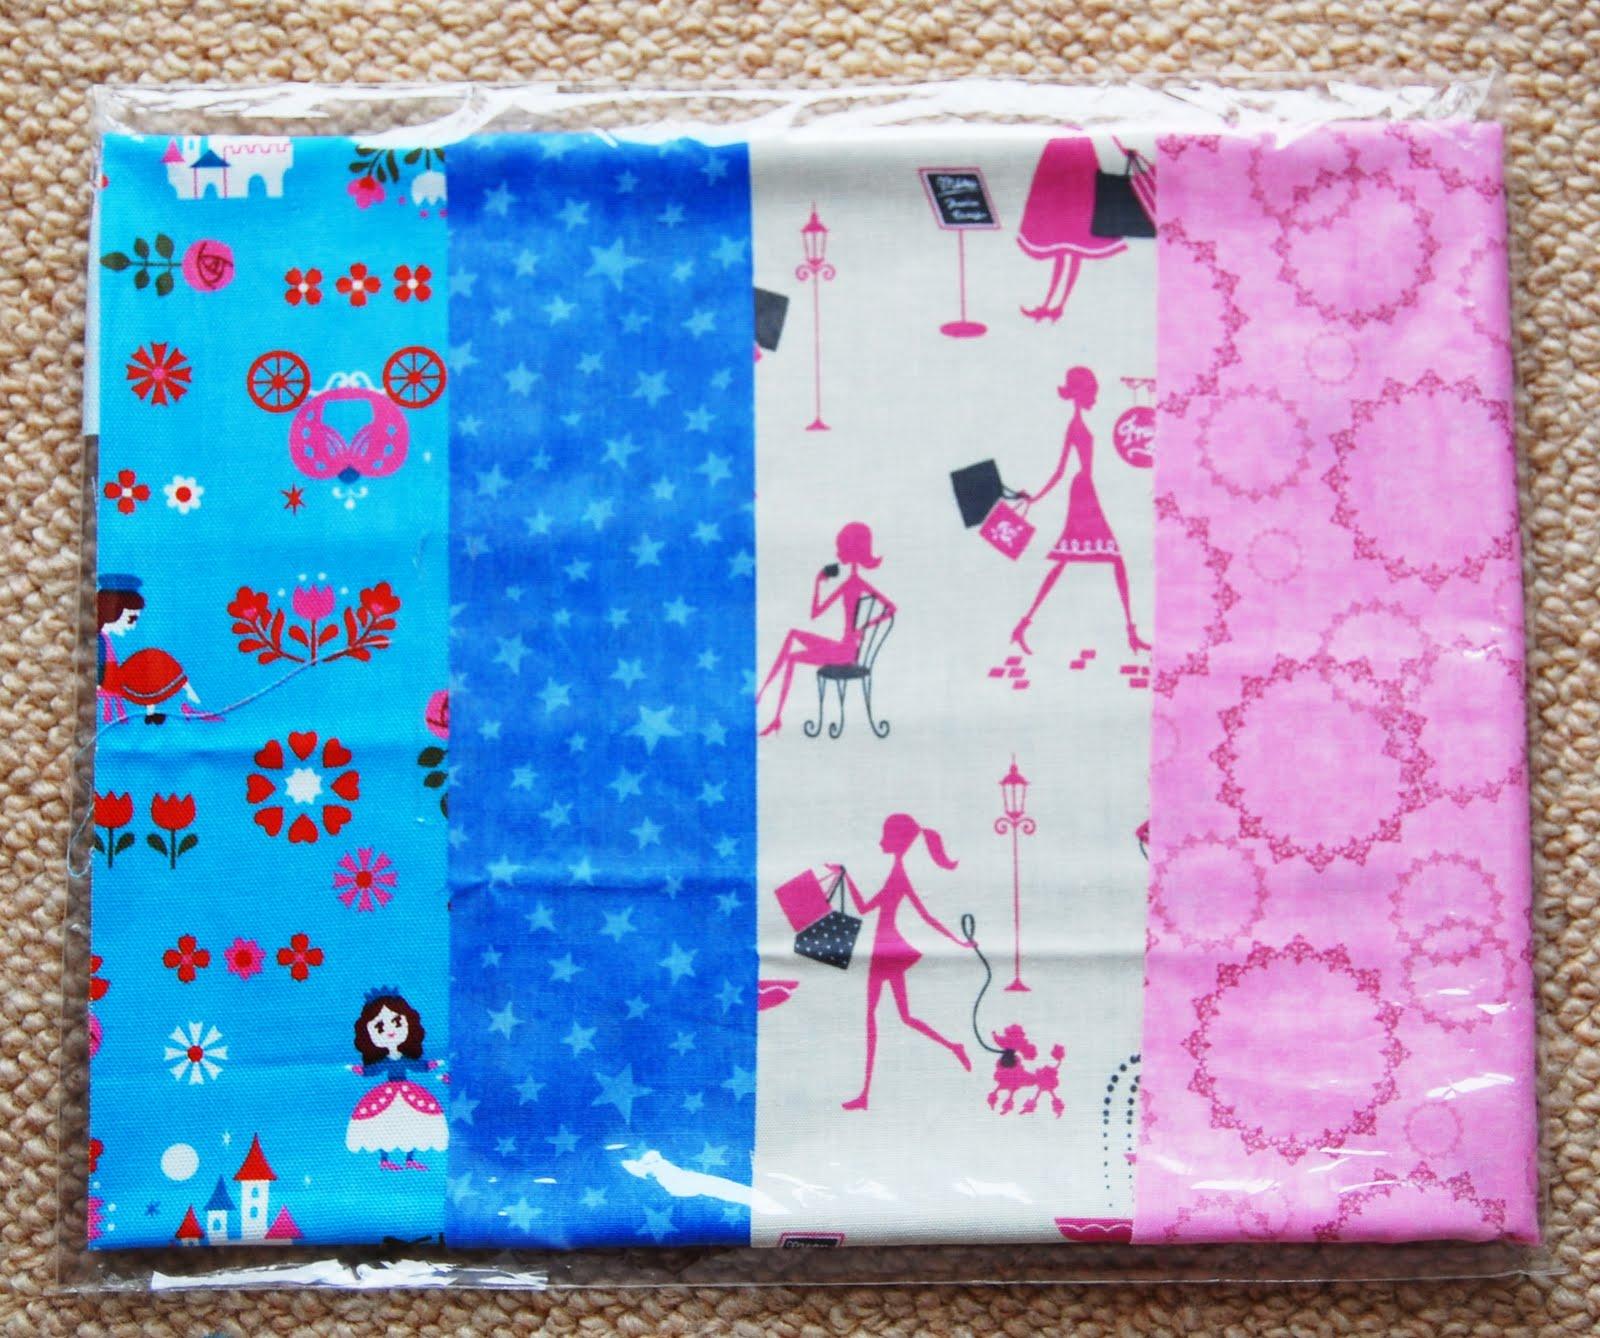 Mybotang fabric scrap series cards - 2 Code Name Fe2